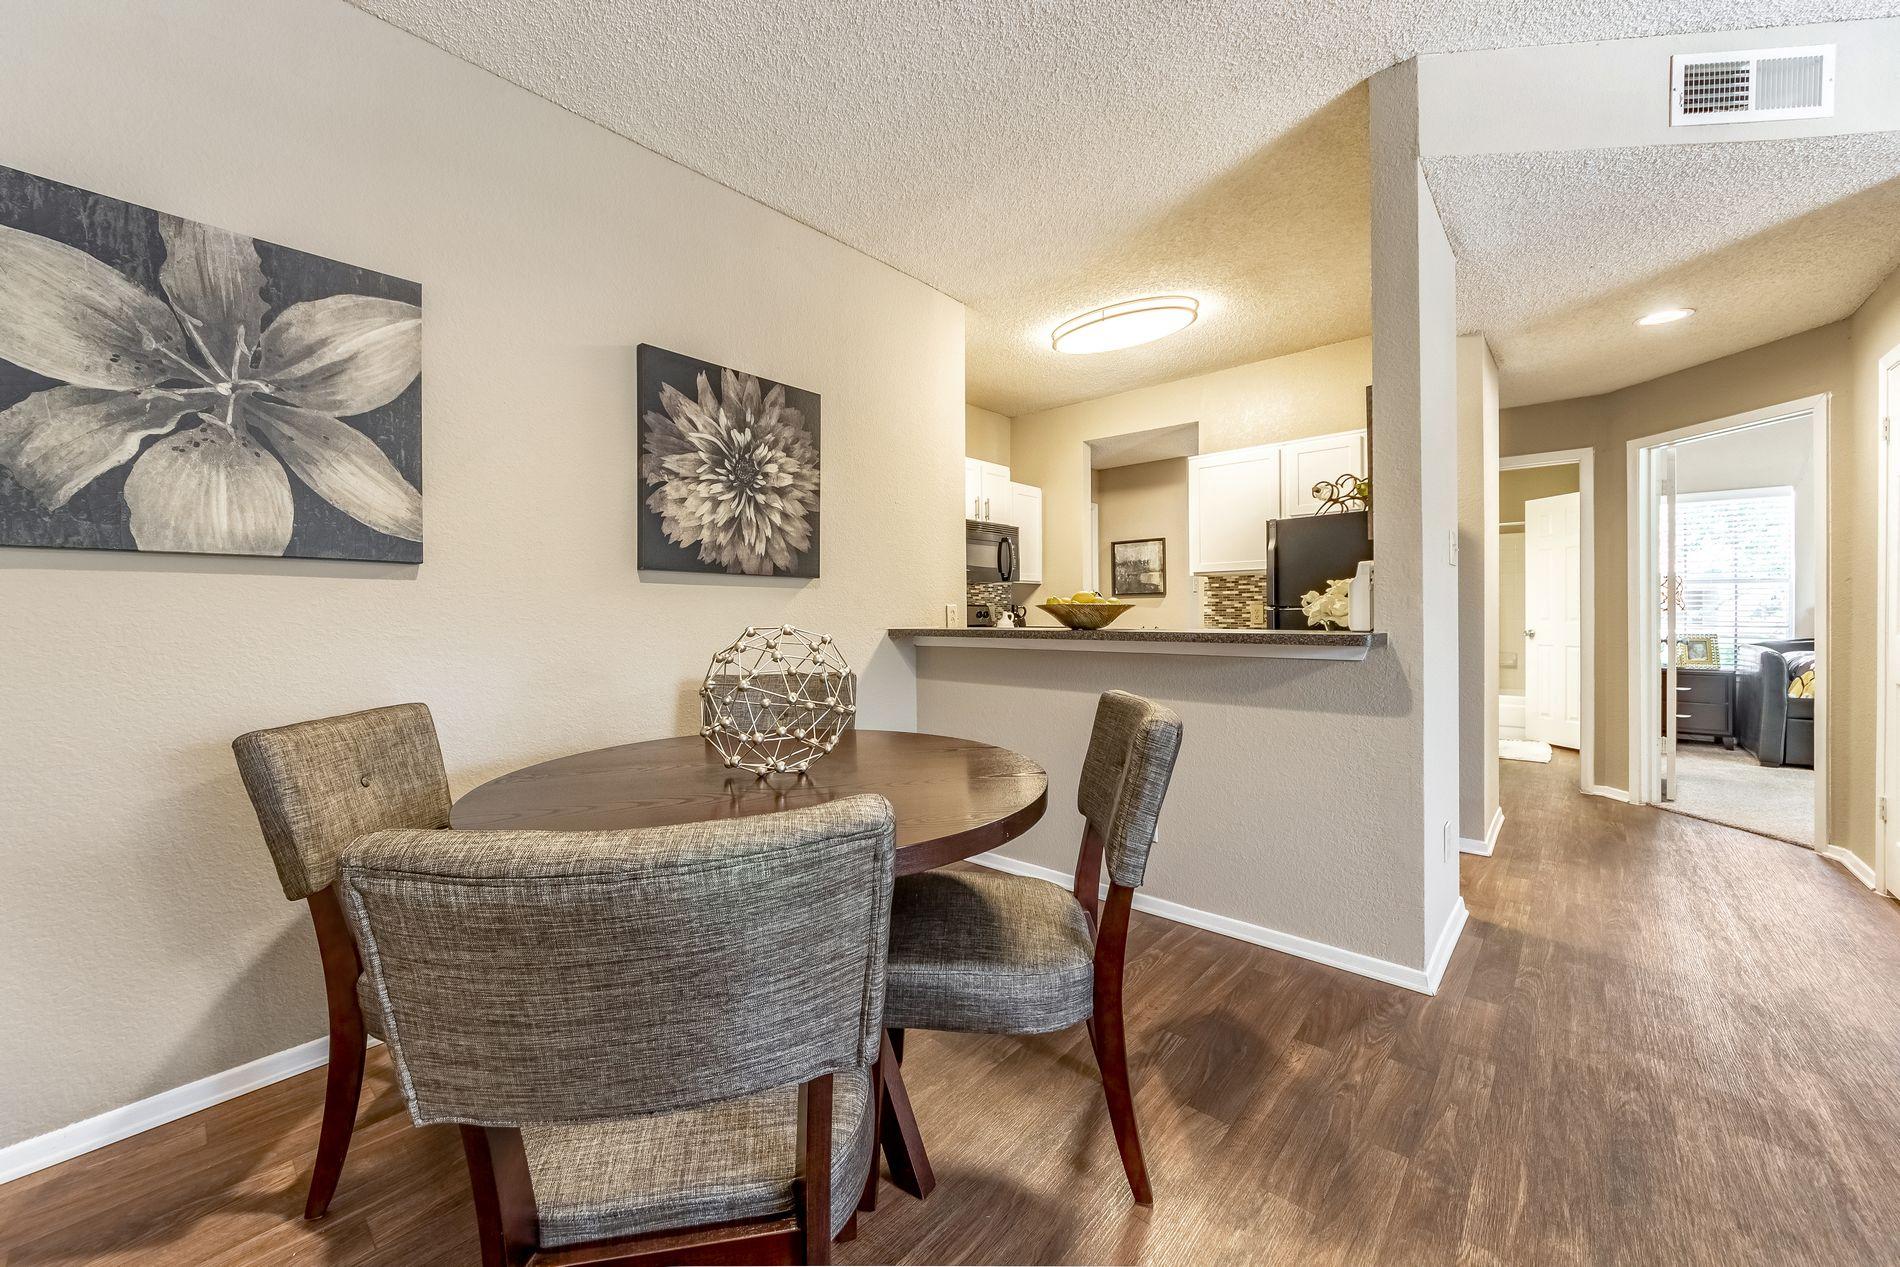 Model Dining Area at La Costa Apartments in Plano, Texas, TX